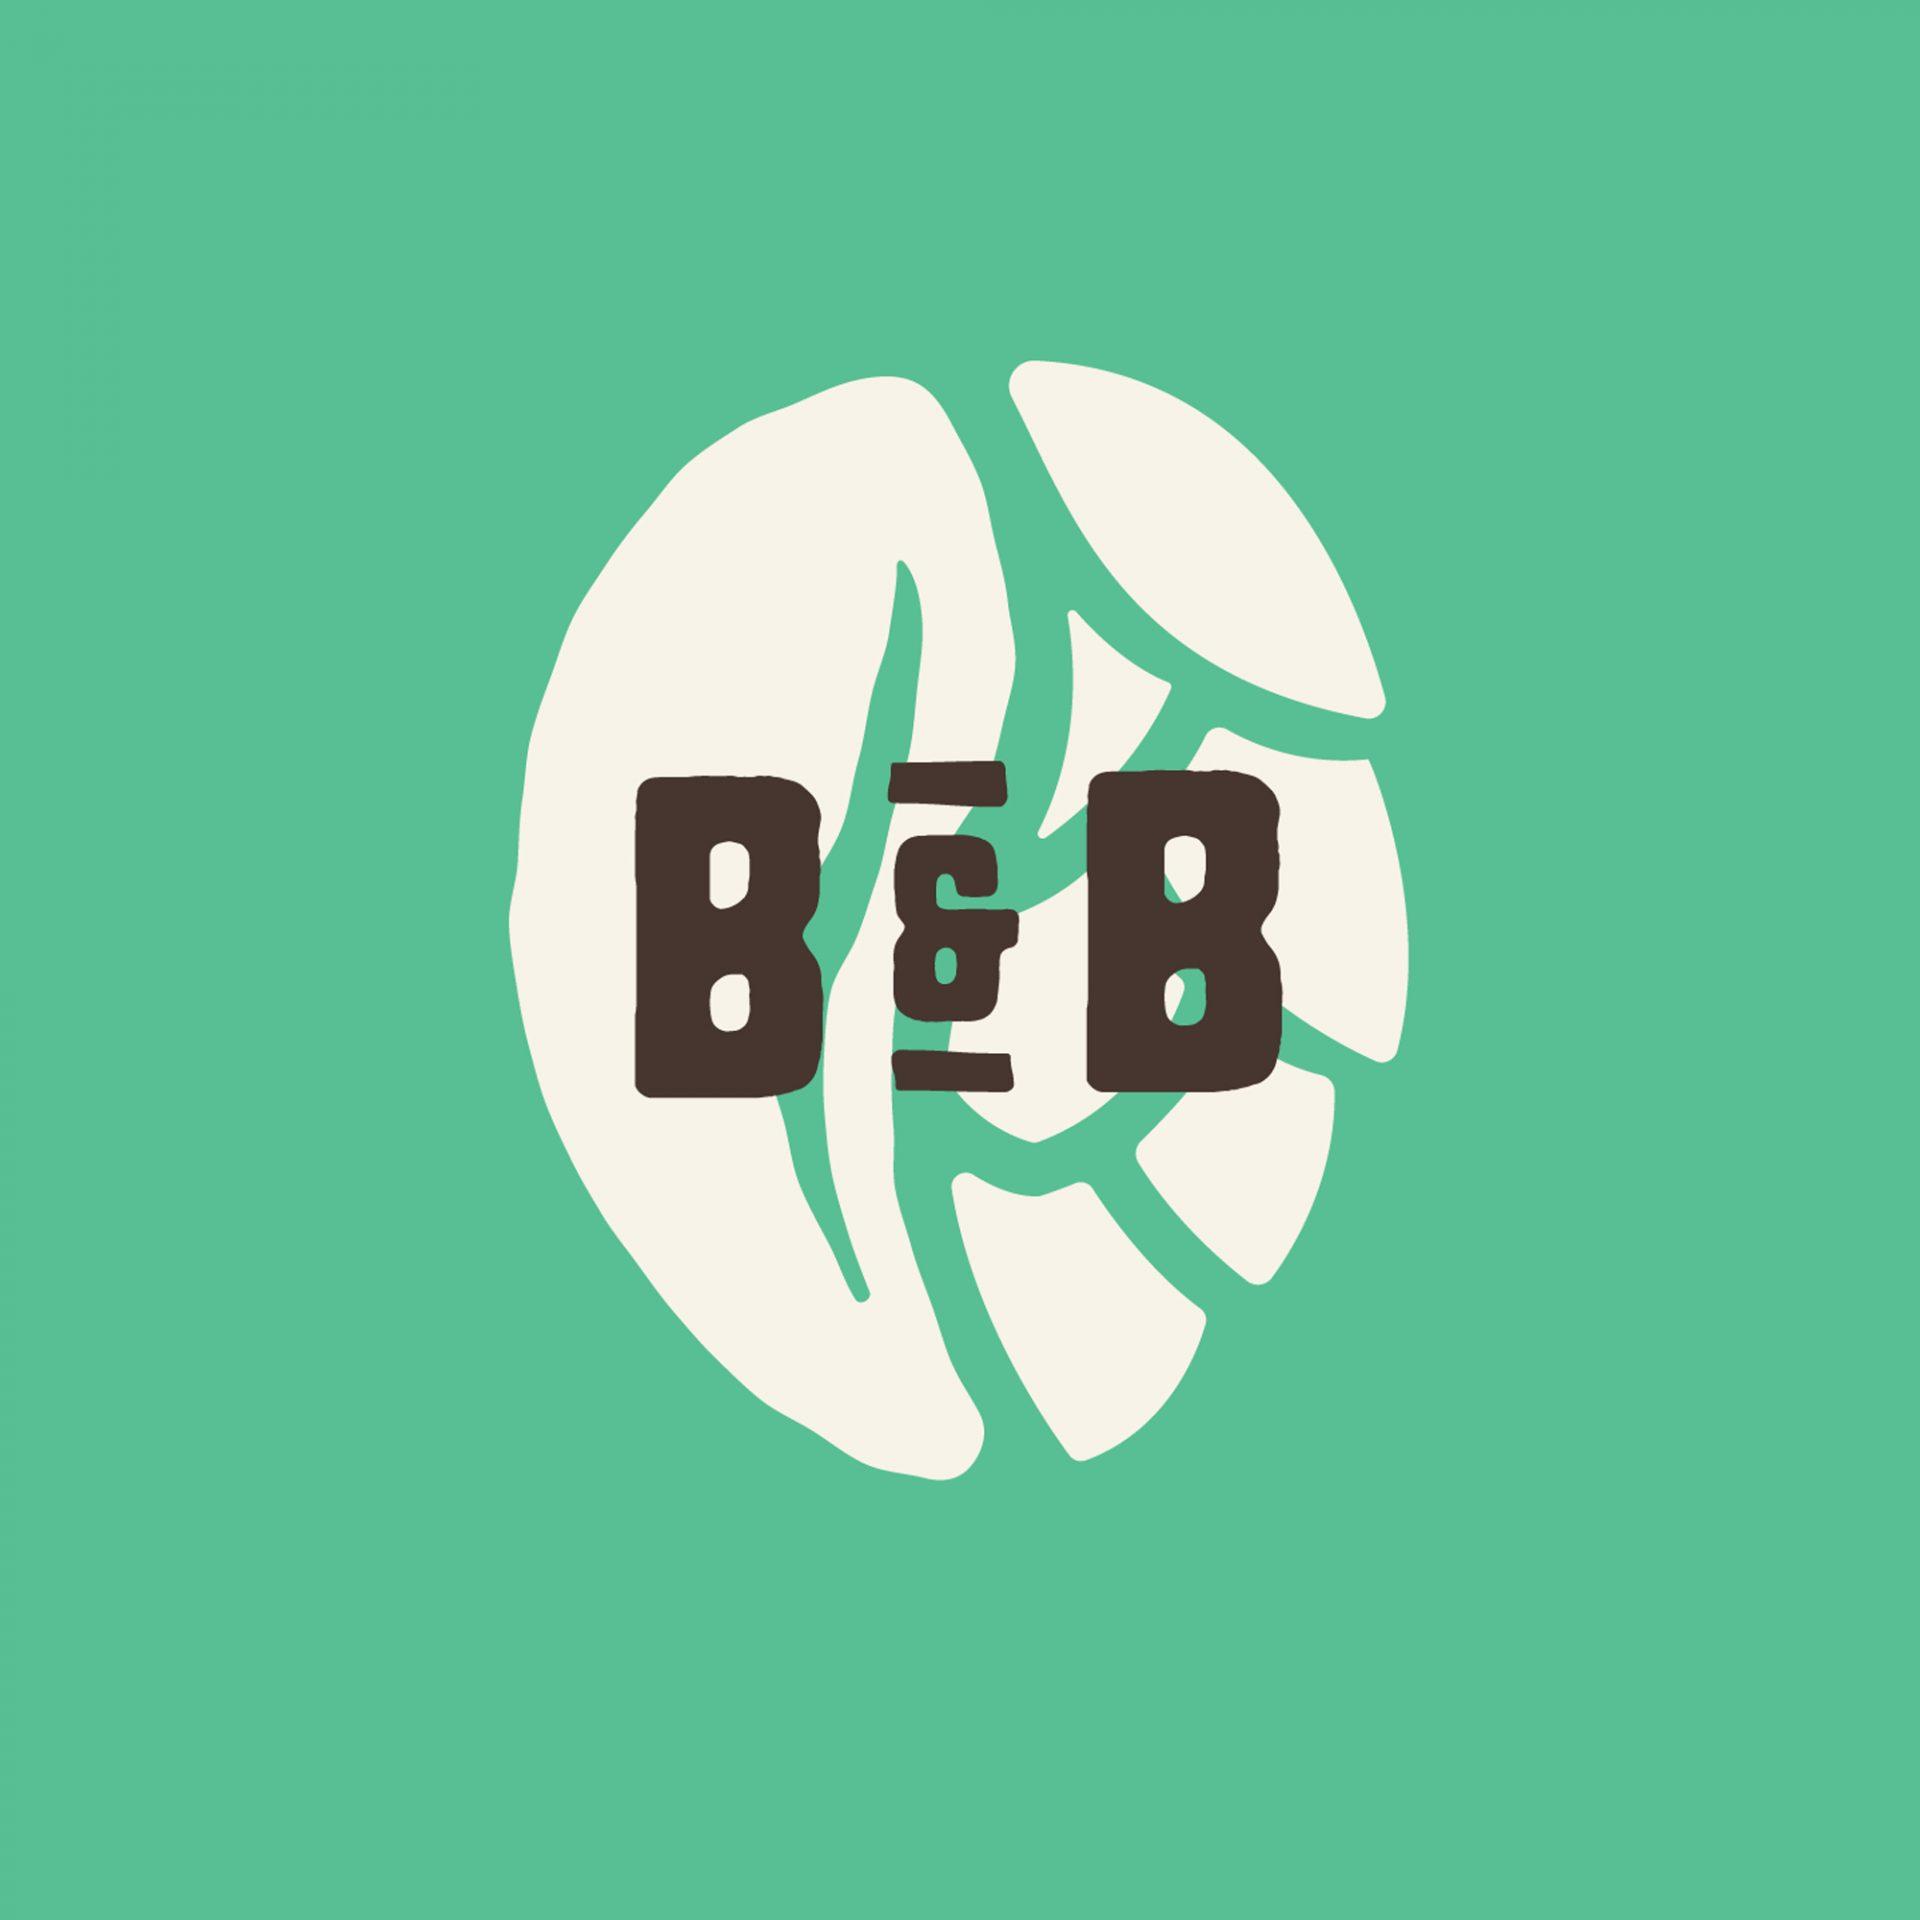 B&B-Teasers